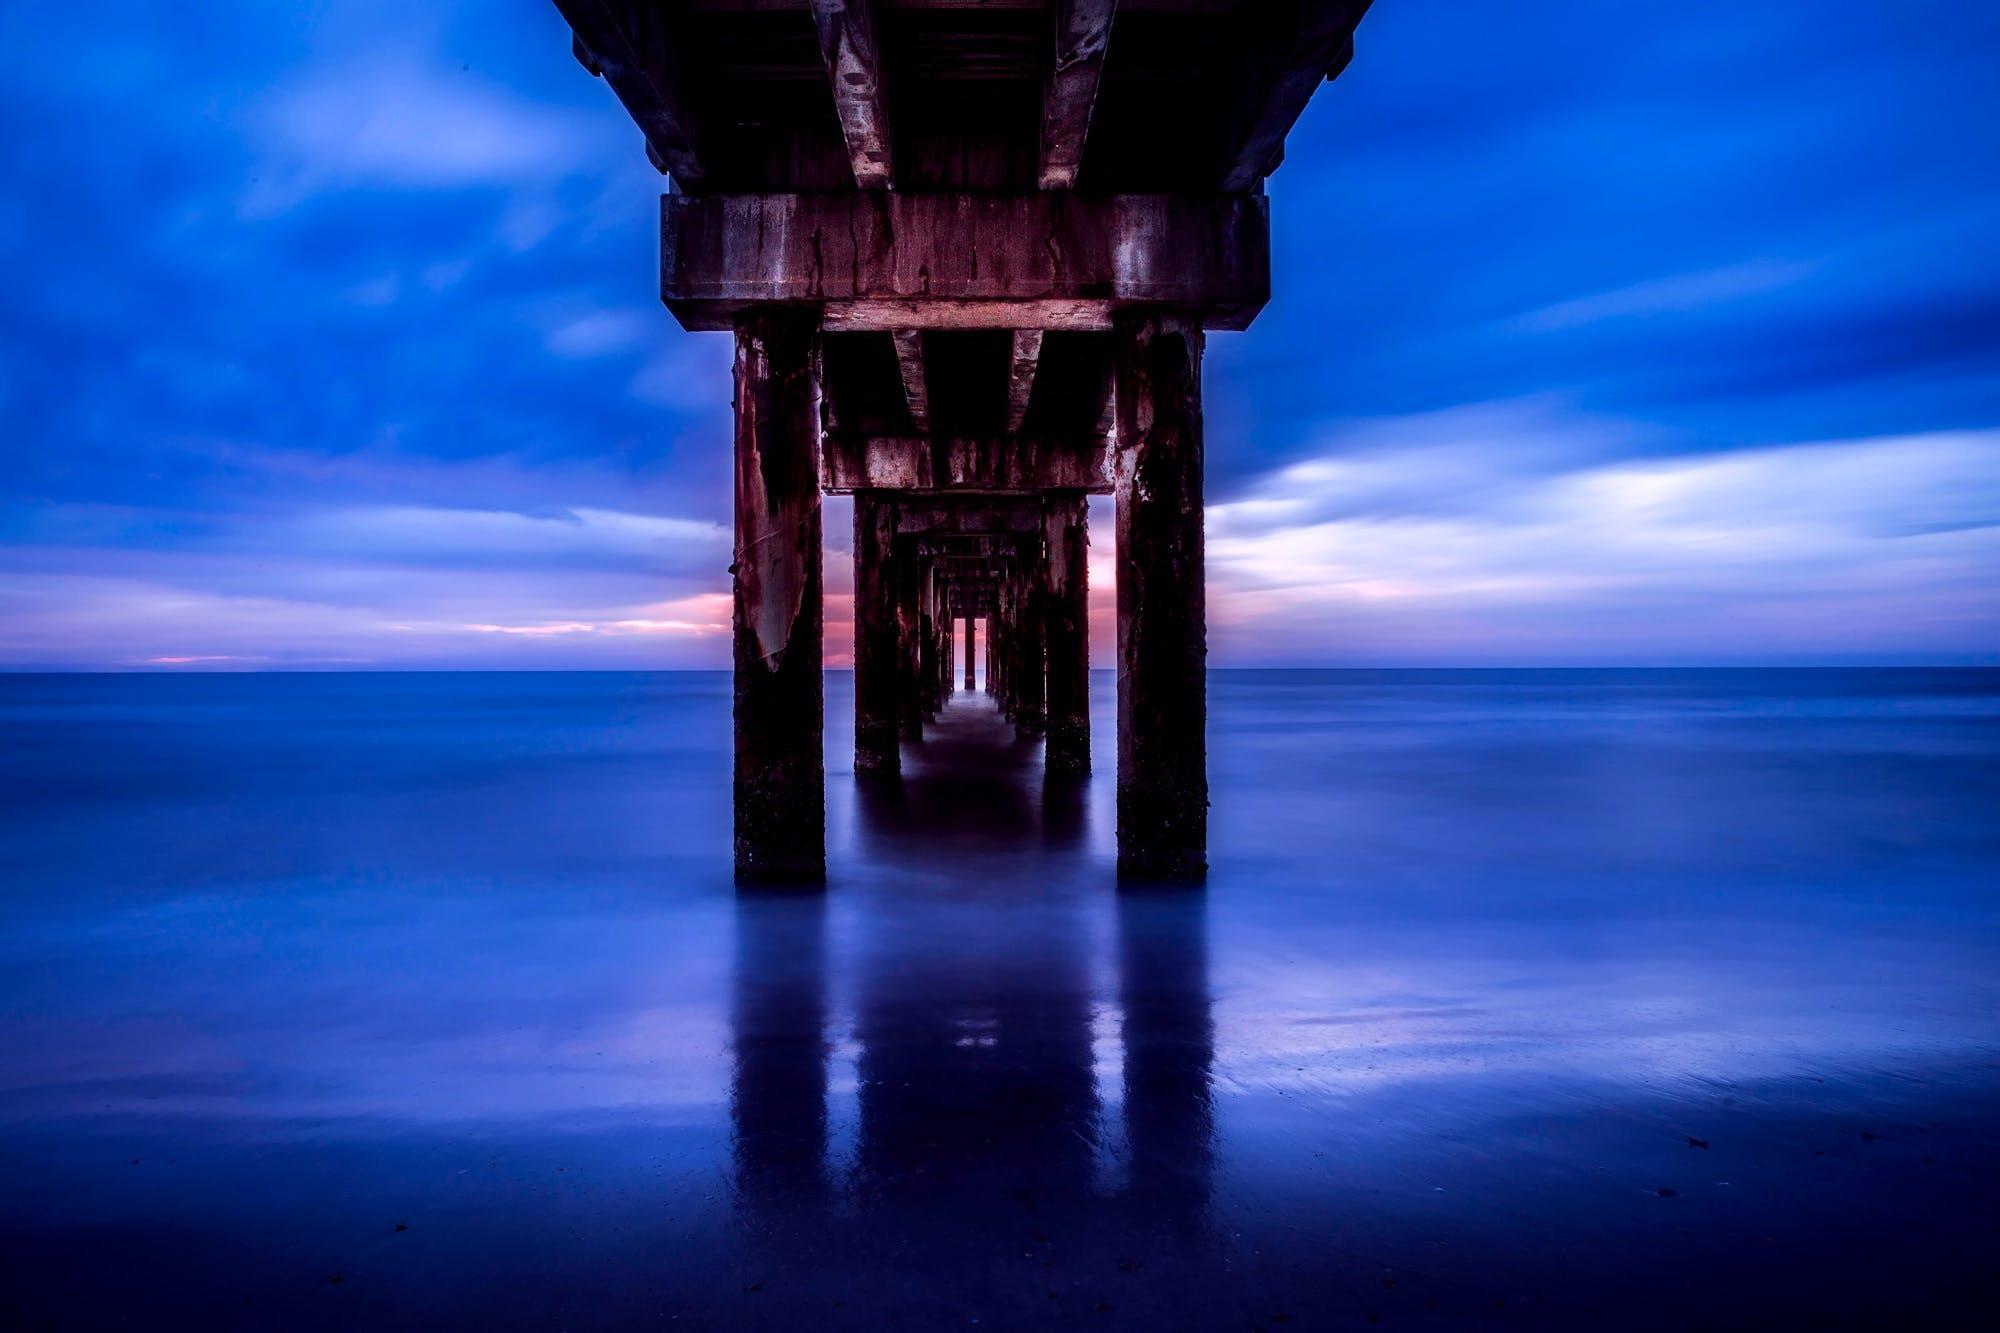 Free stock photo of sea, sky, sunset, holiday